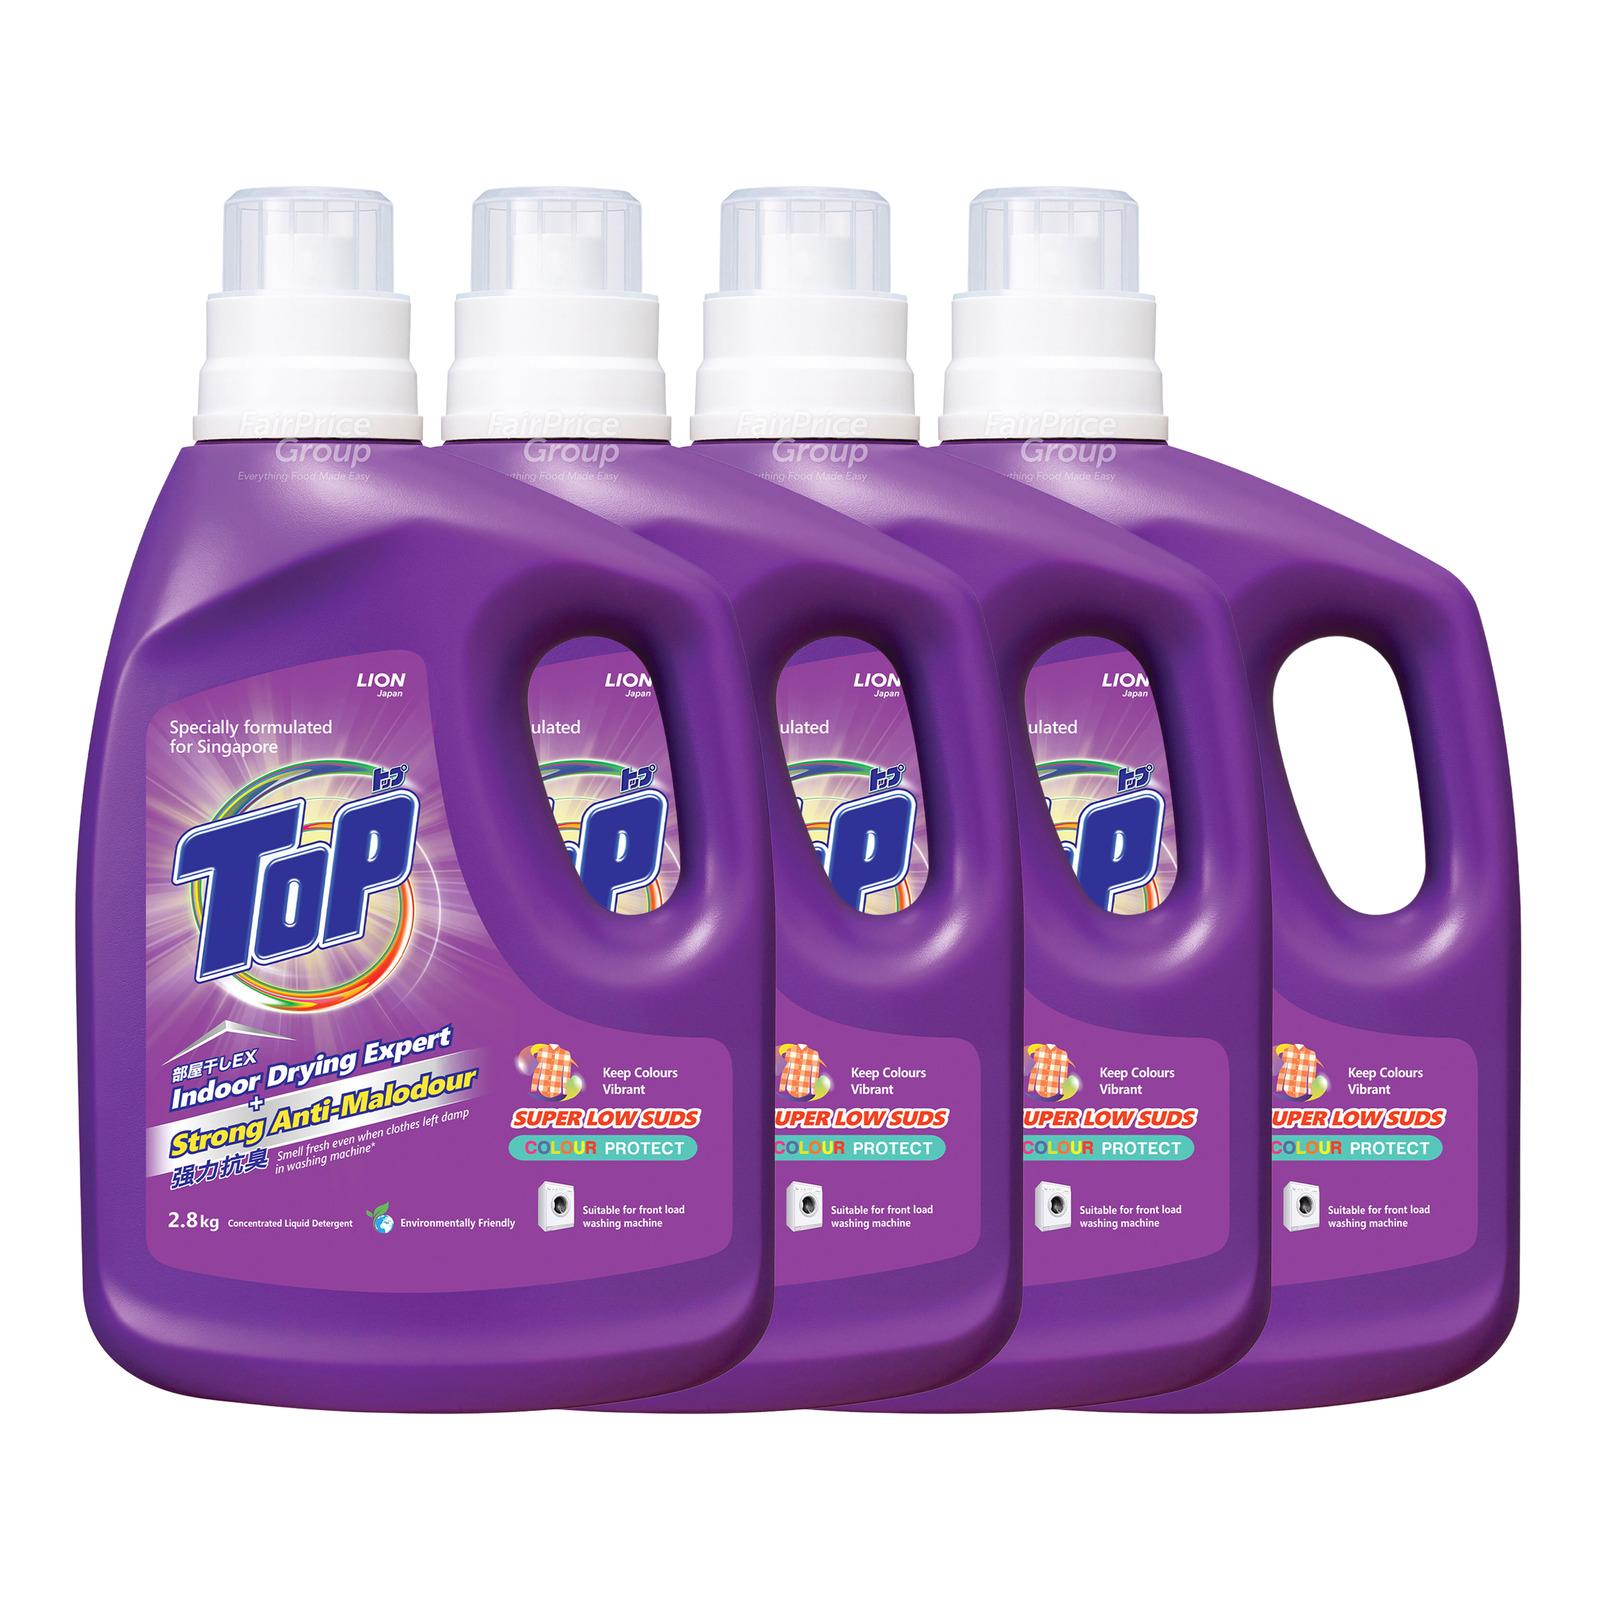 Top Concentrated Liquid Detergent - Super Low Suds